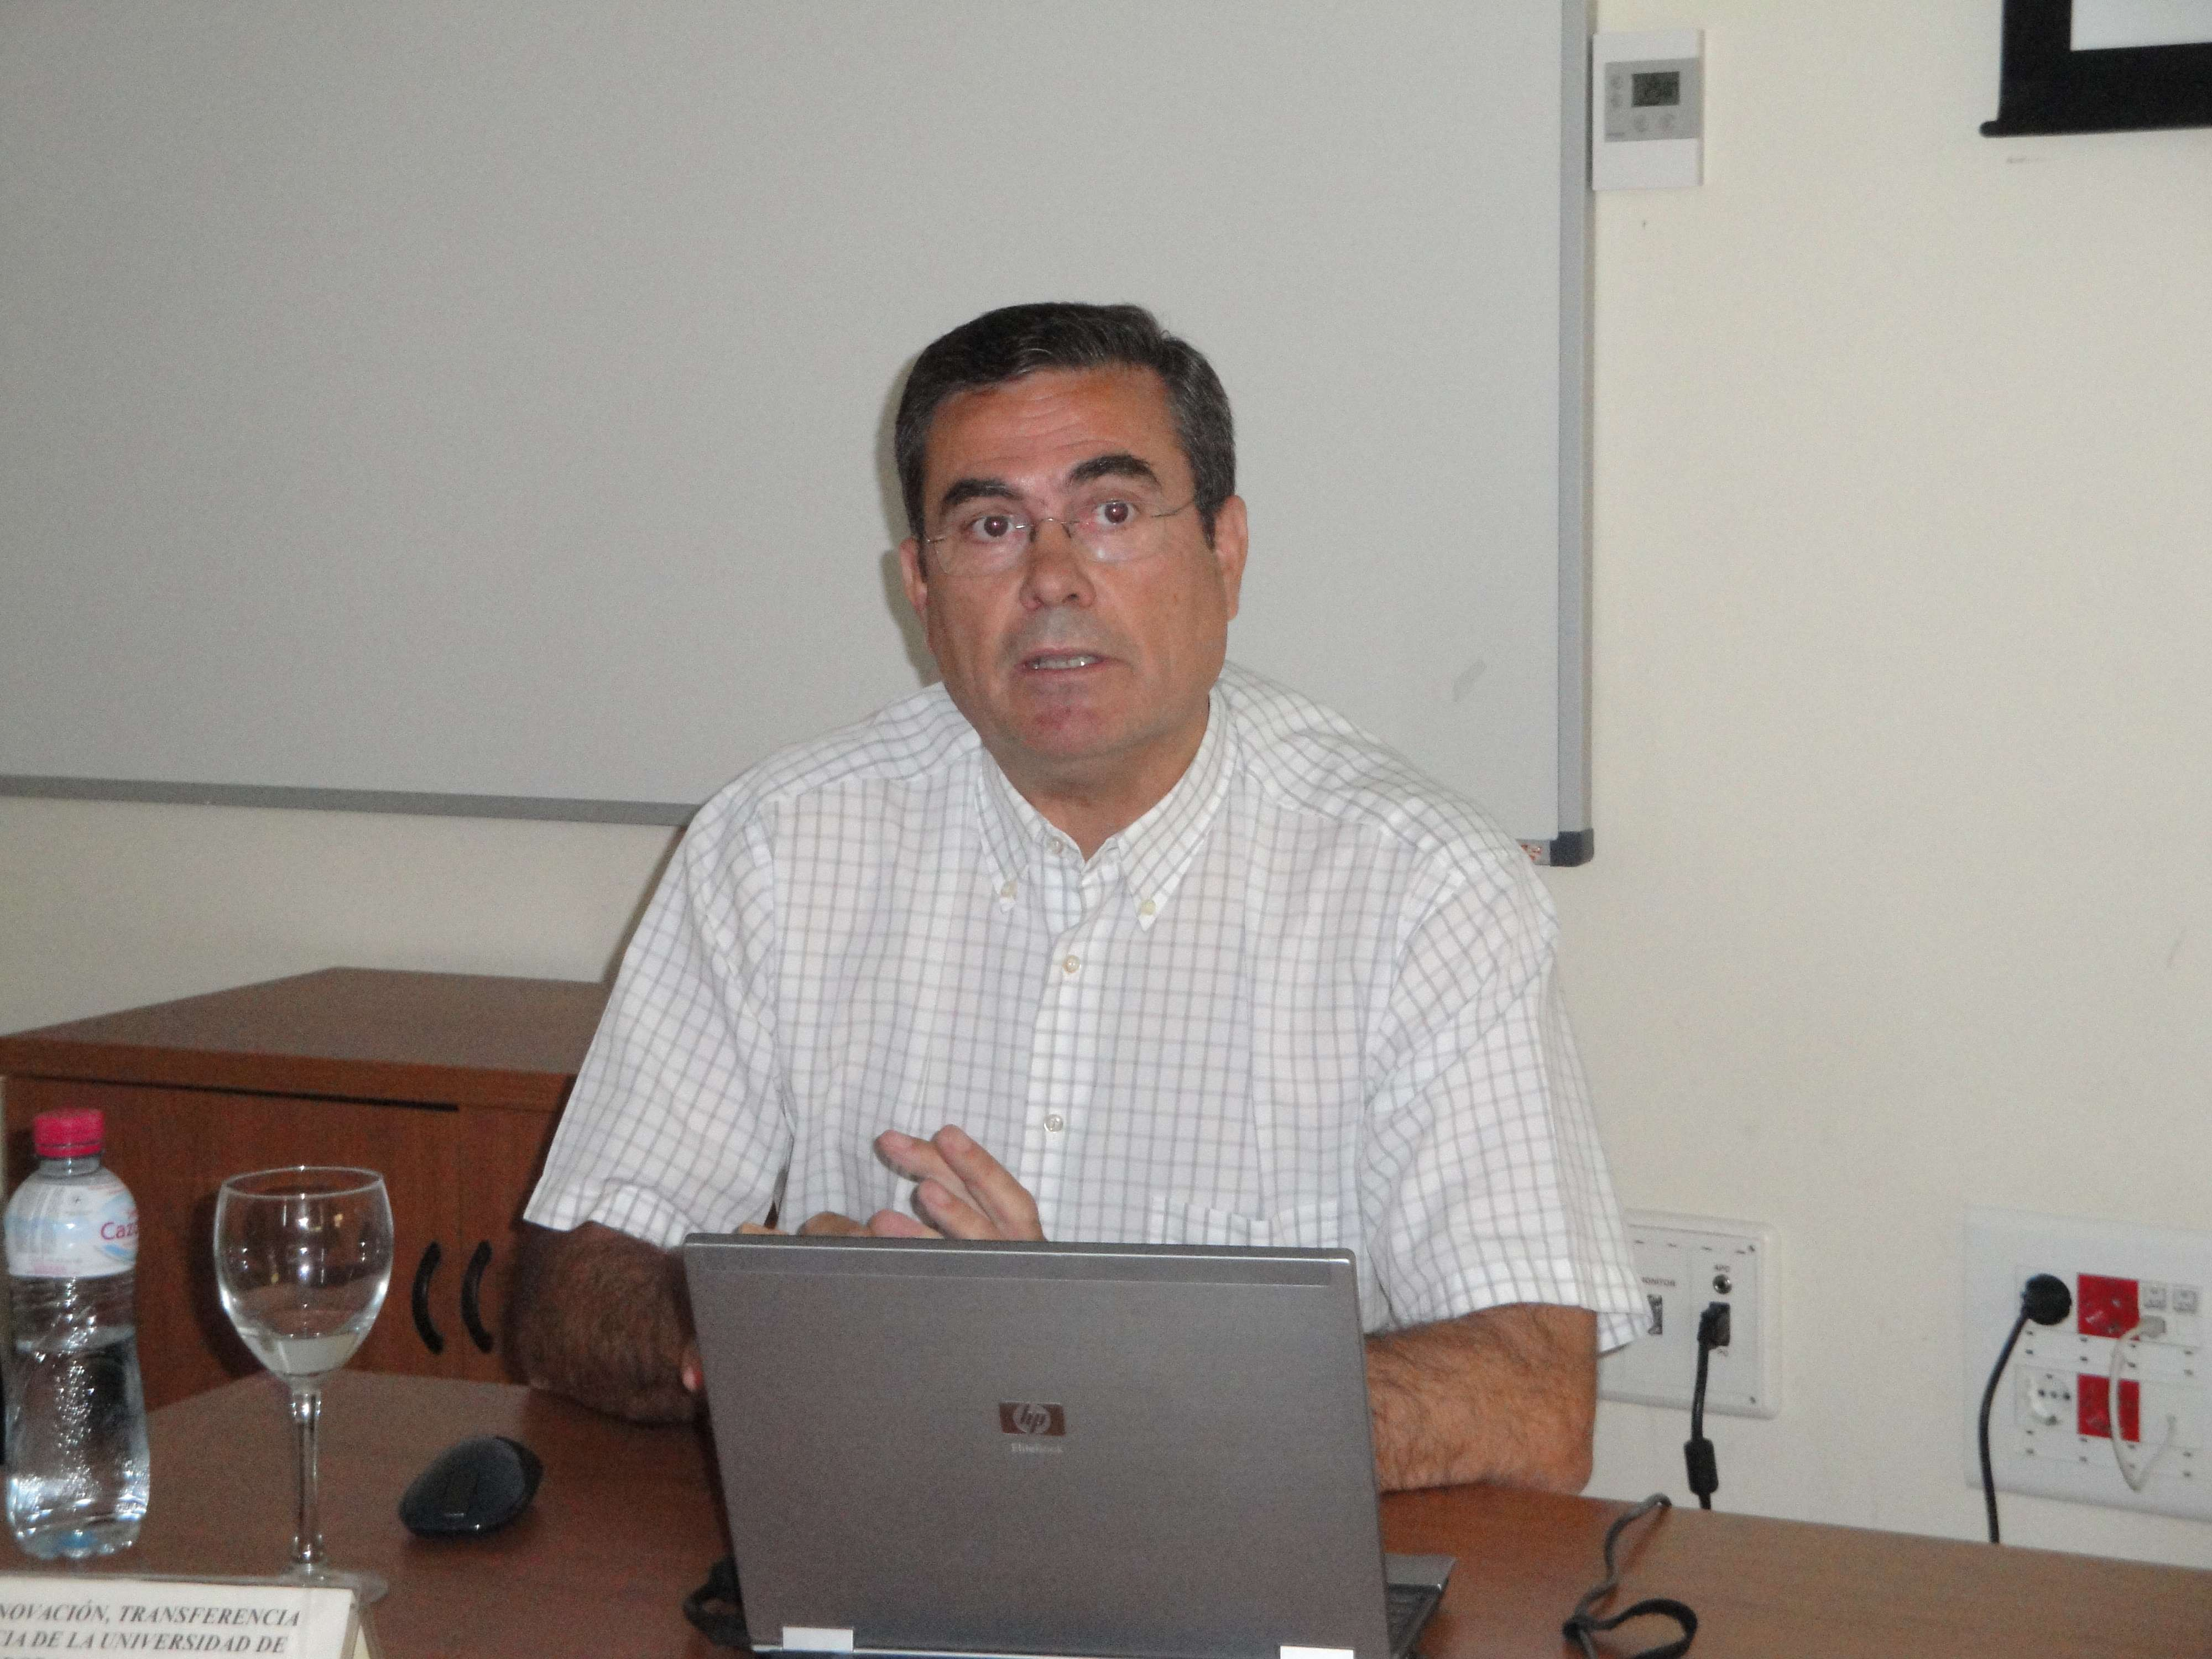 Antonio Trapero